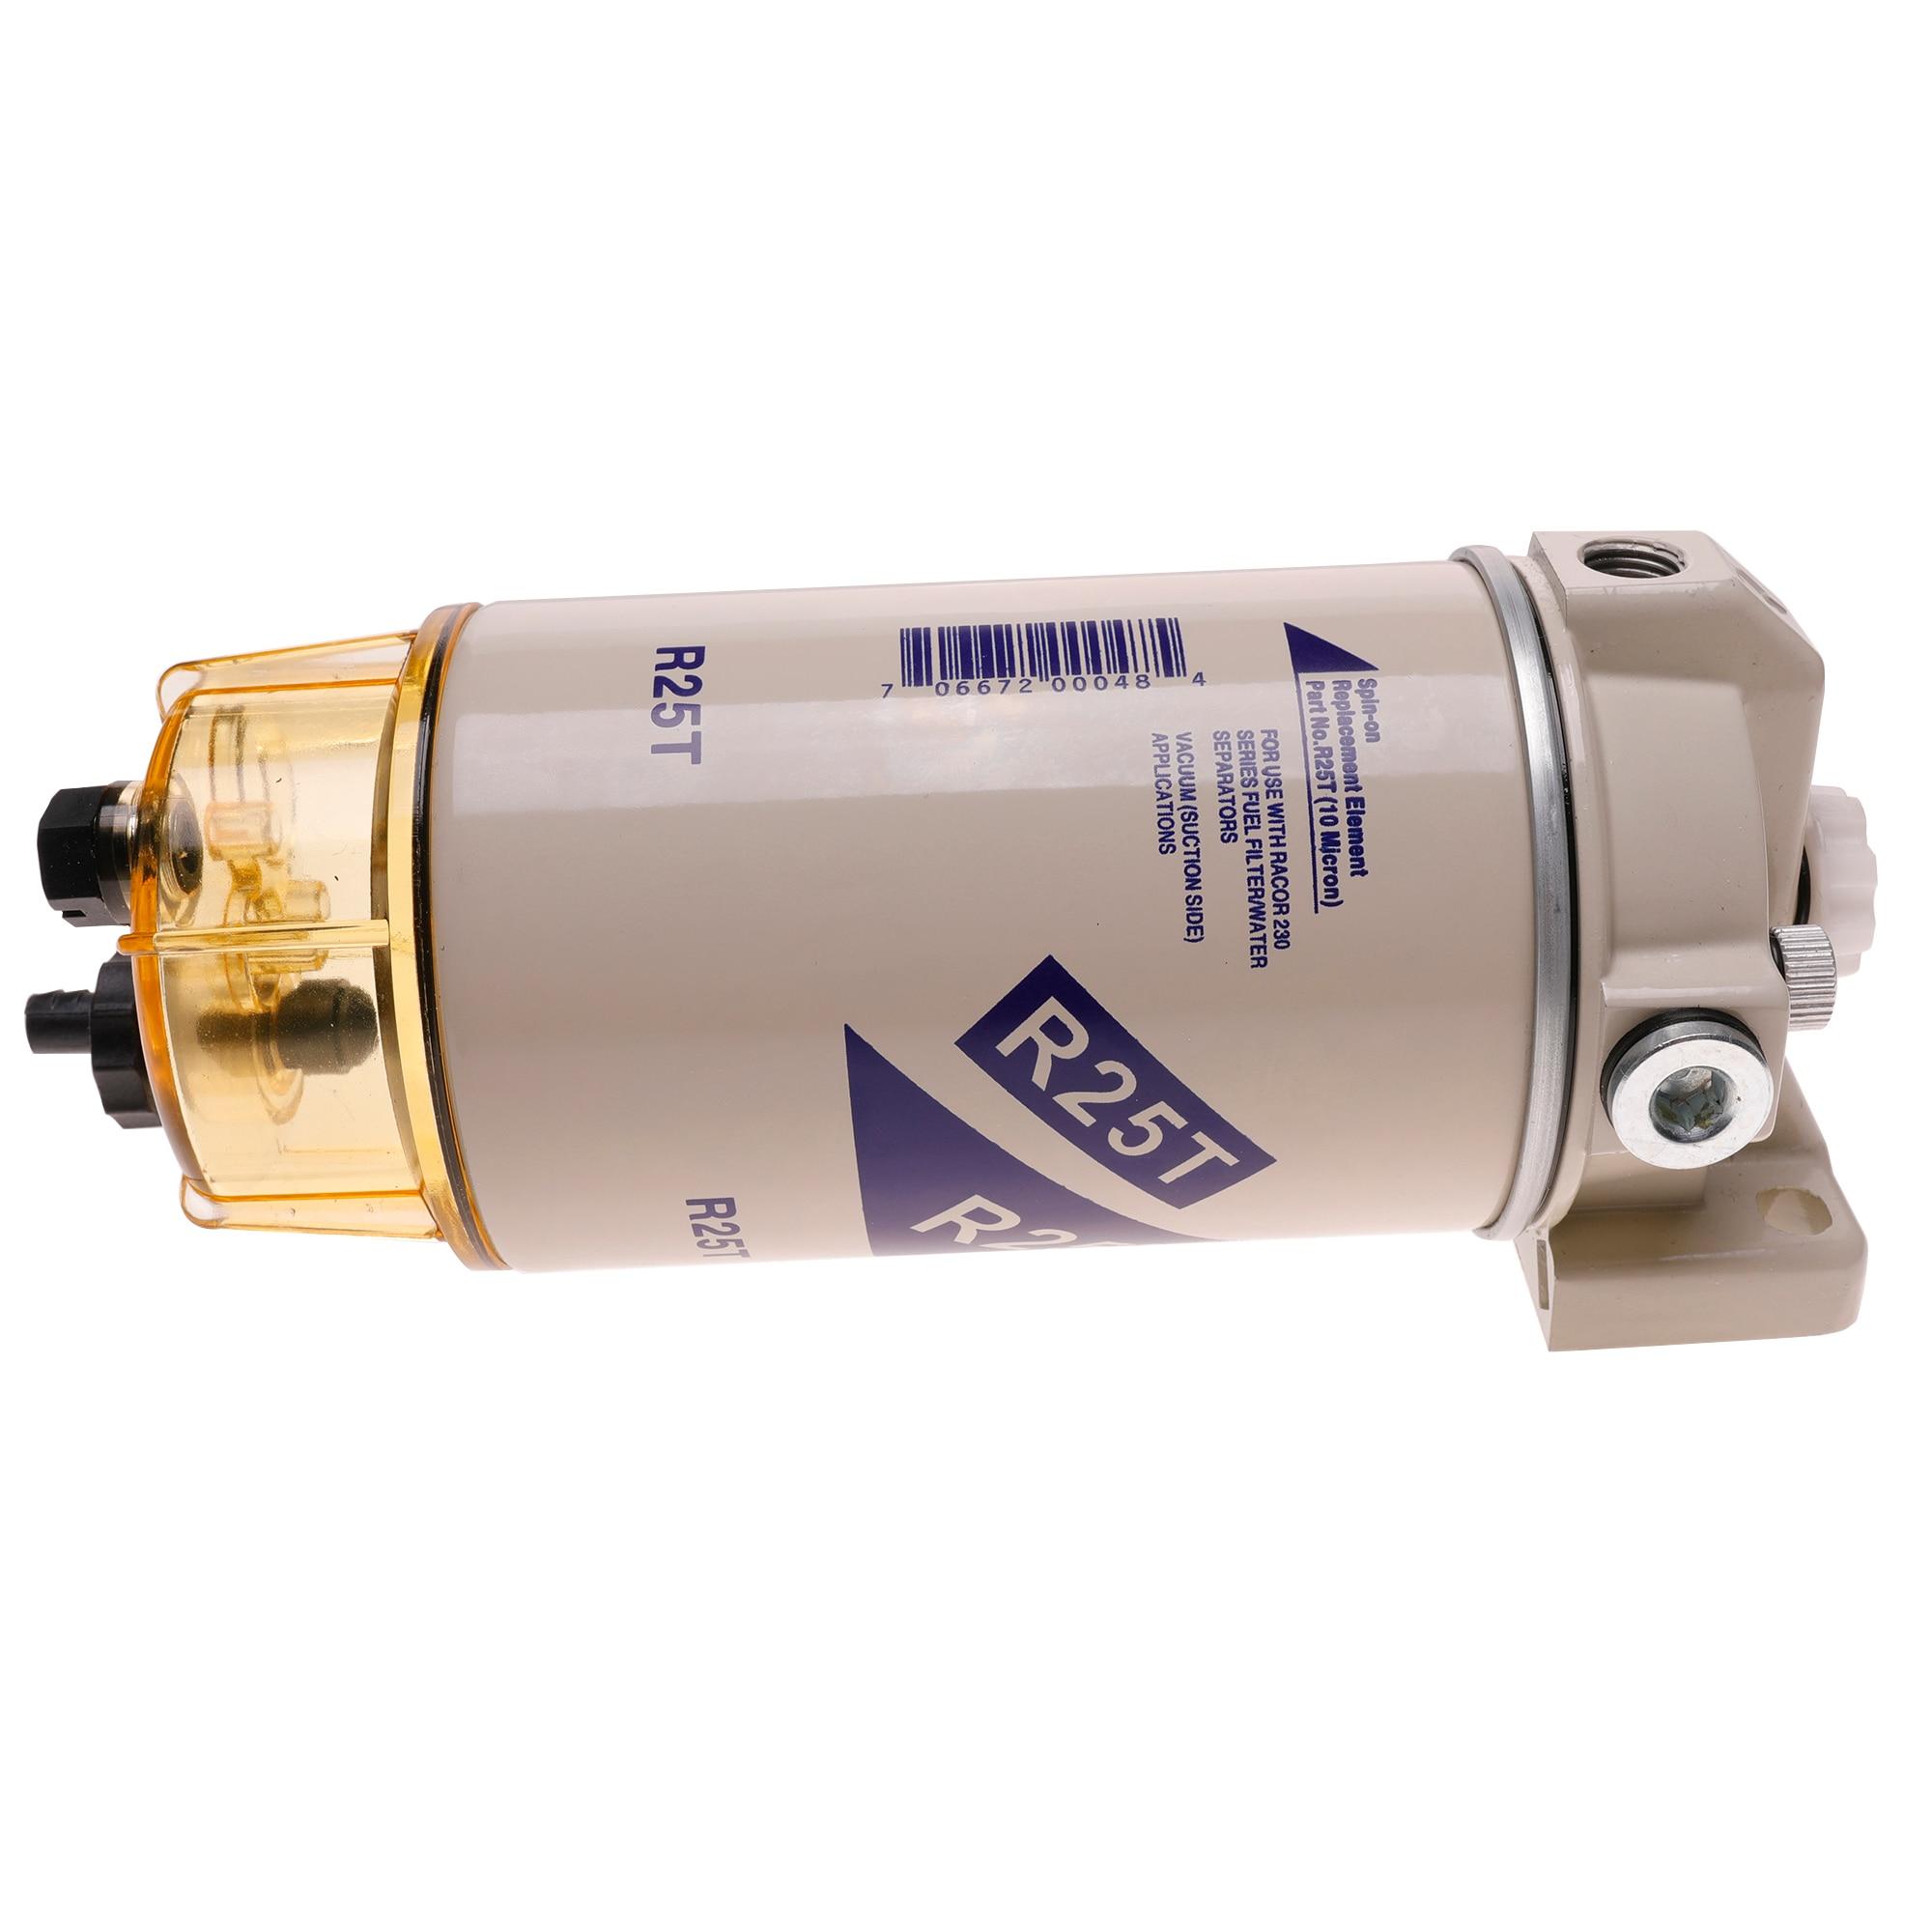 Racor 320R-RAC-01 Fuel Filter Water Separator